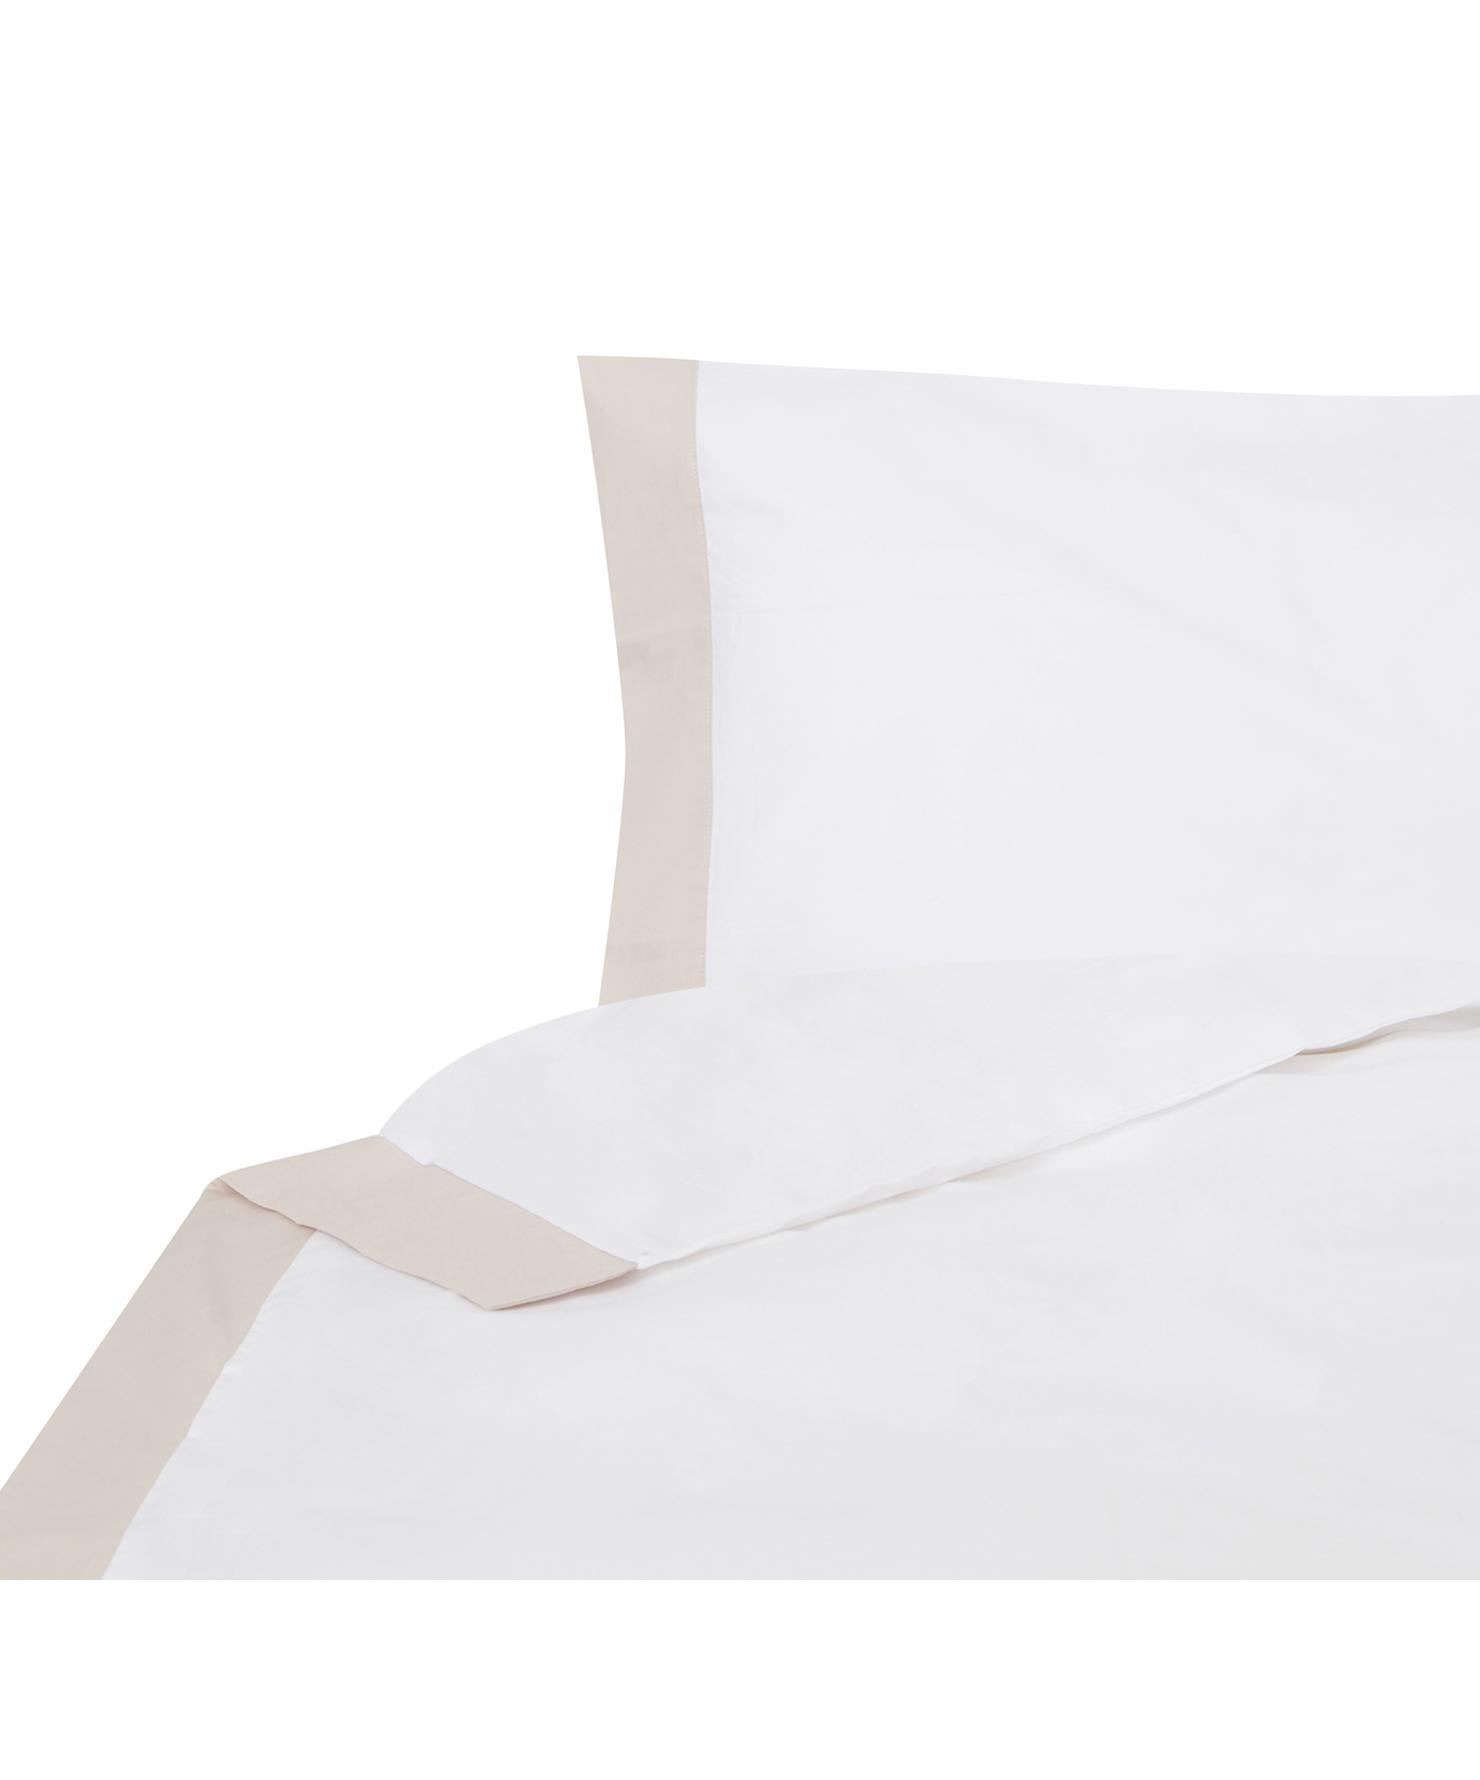 Funda nórdica Camalisa, Algodón, Blanco, crema, Cama 90 cm (160 x 220 cm)